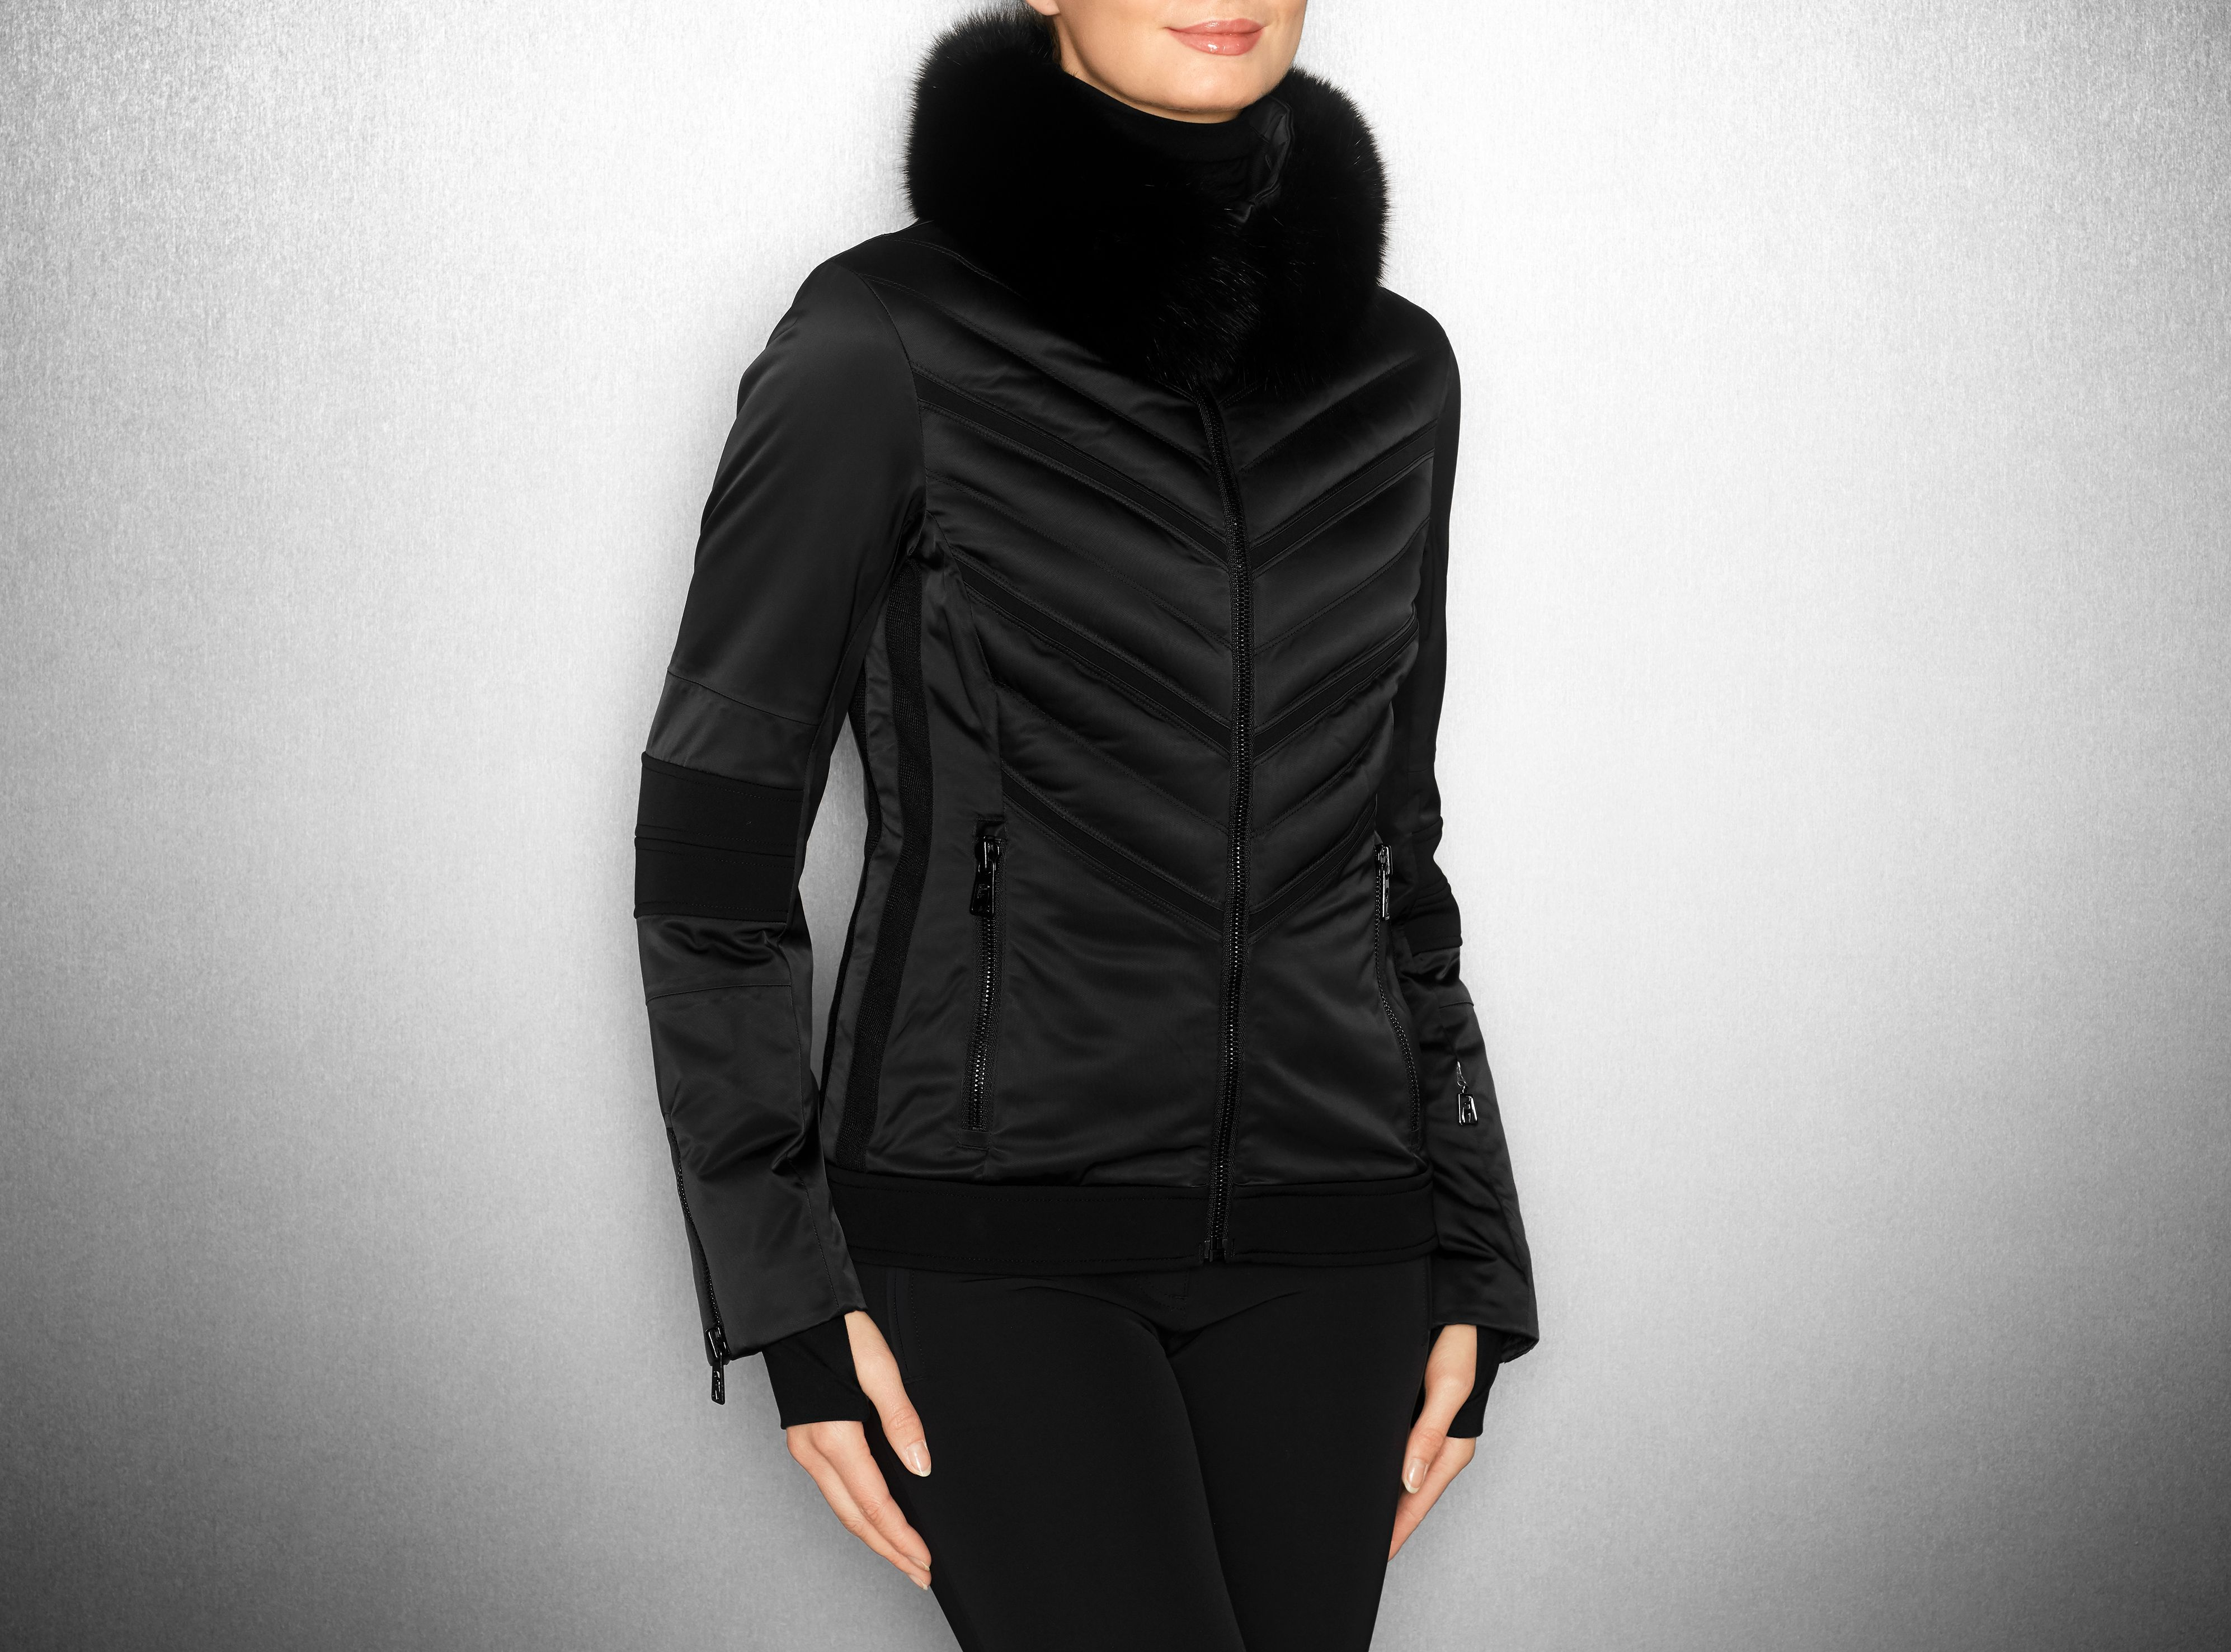 Toni Sailer - MILA fur black - Collection - Women  b700ded52